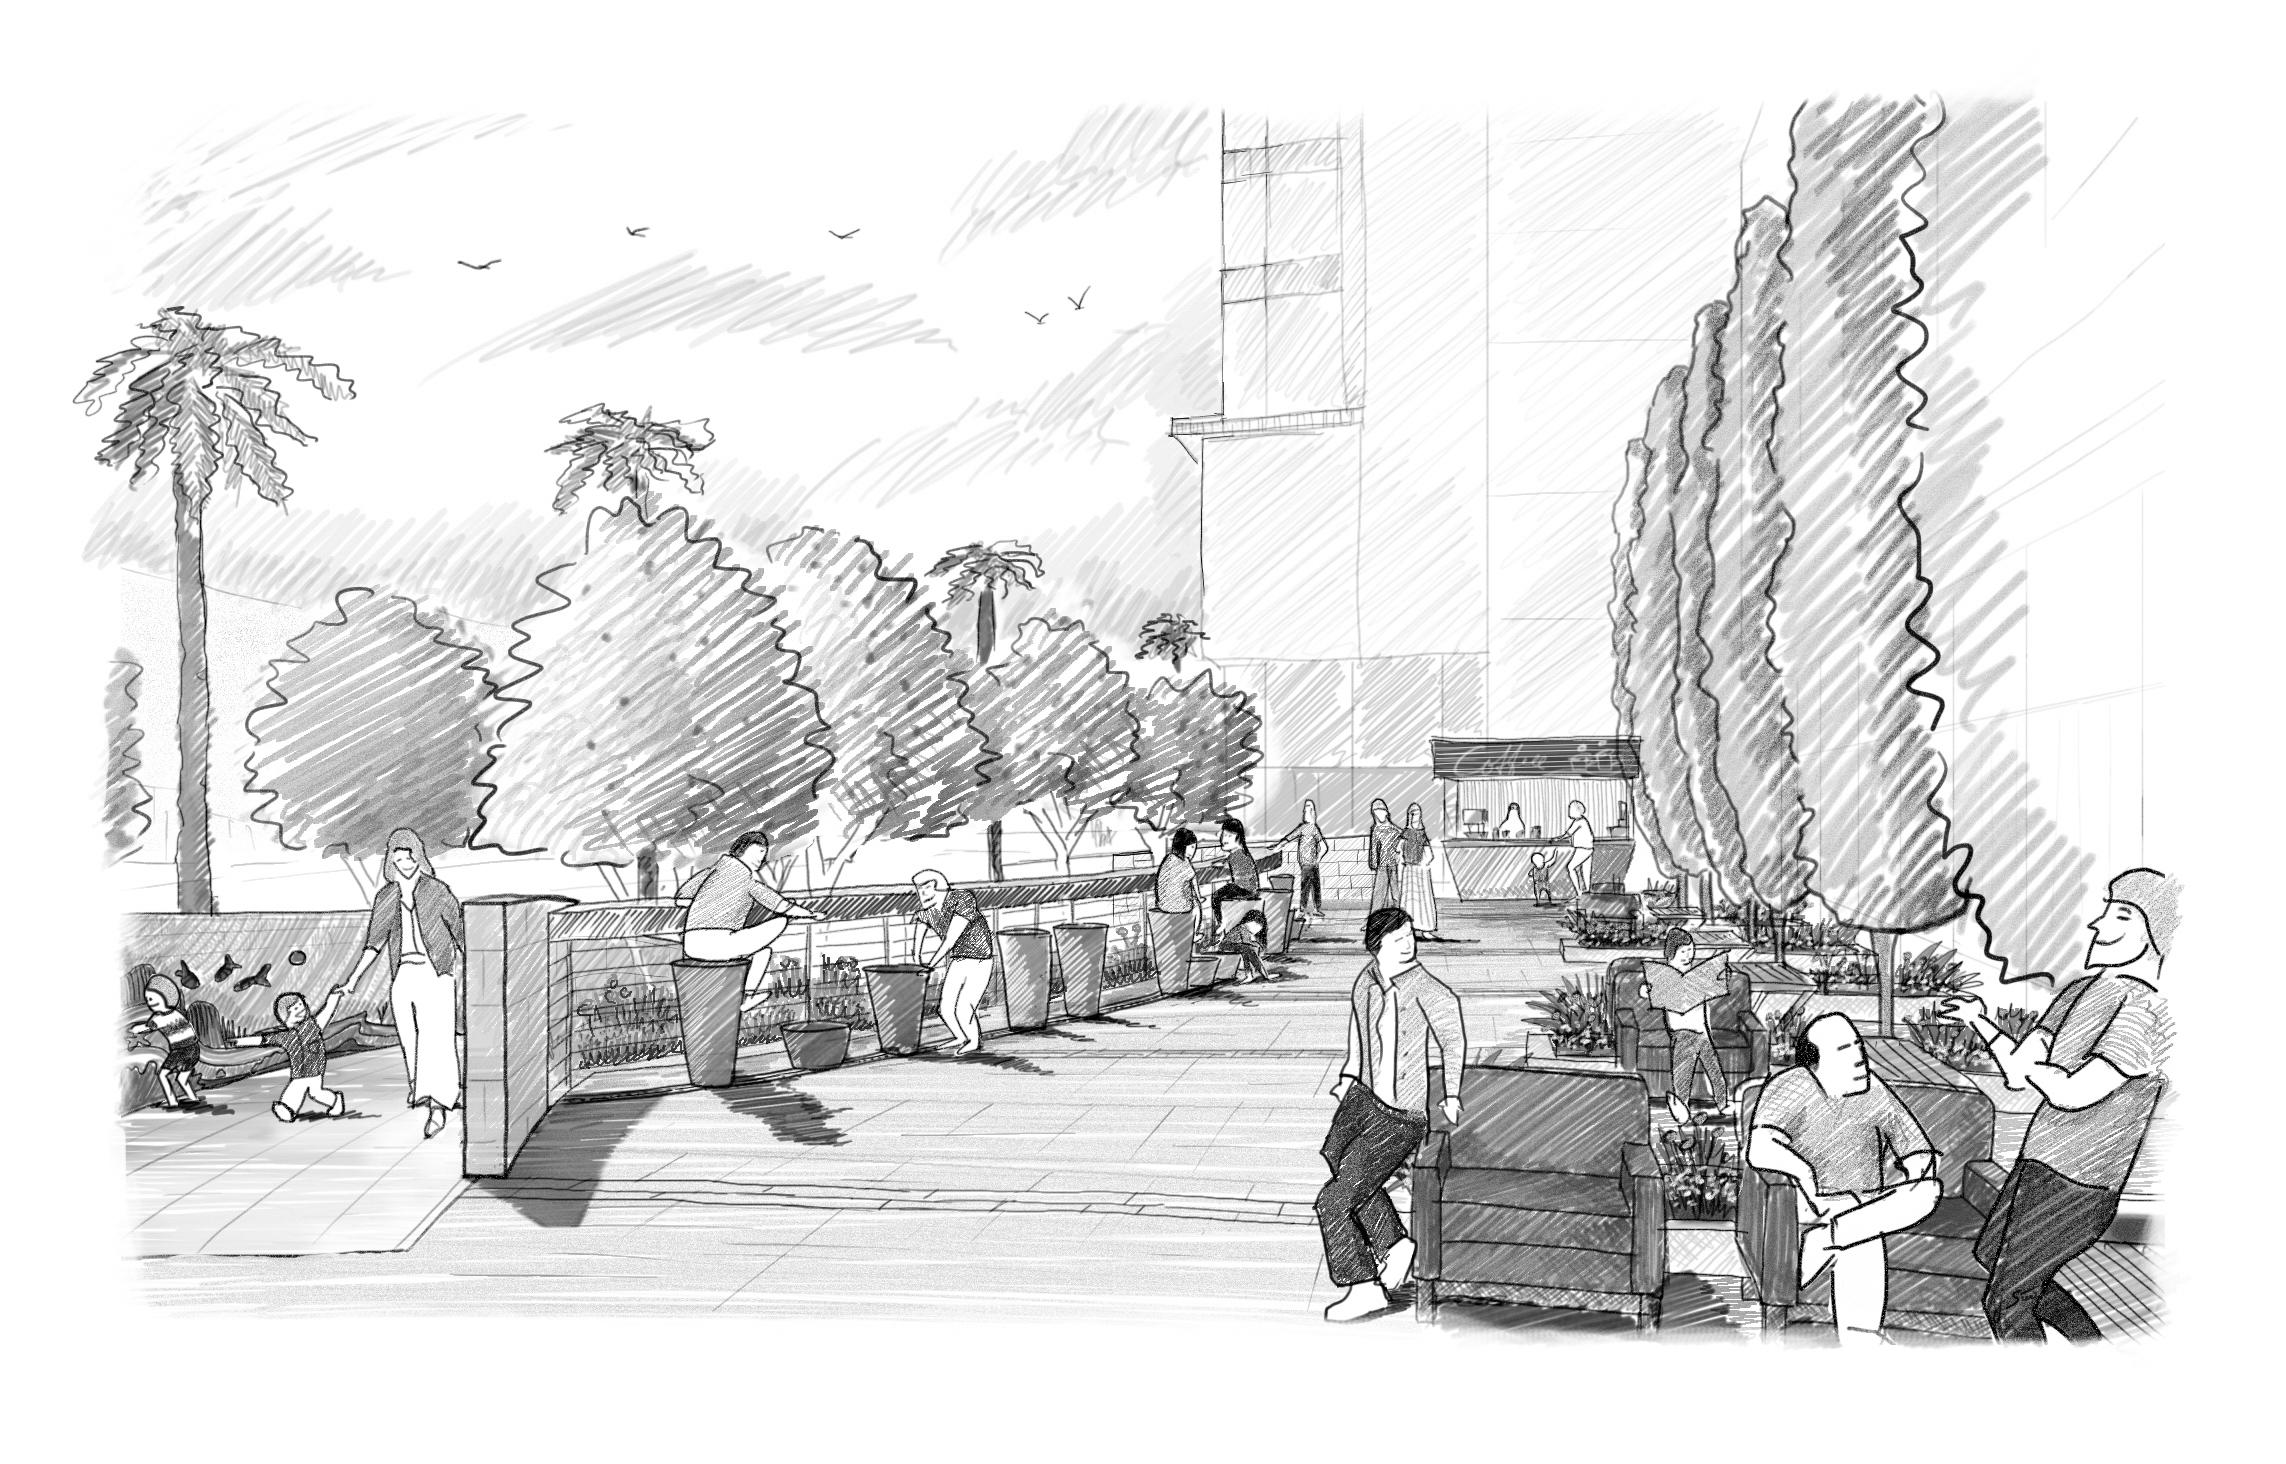 Sketch_07_Stools_3rdSt_Plaza_B_BW.jpg